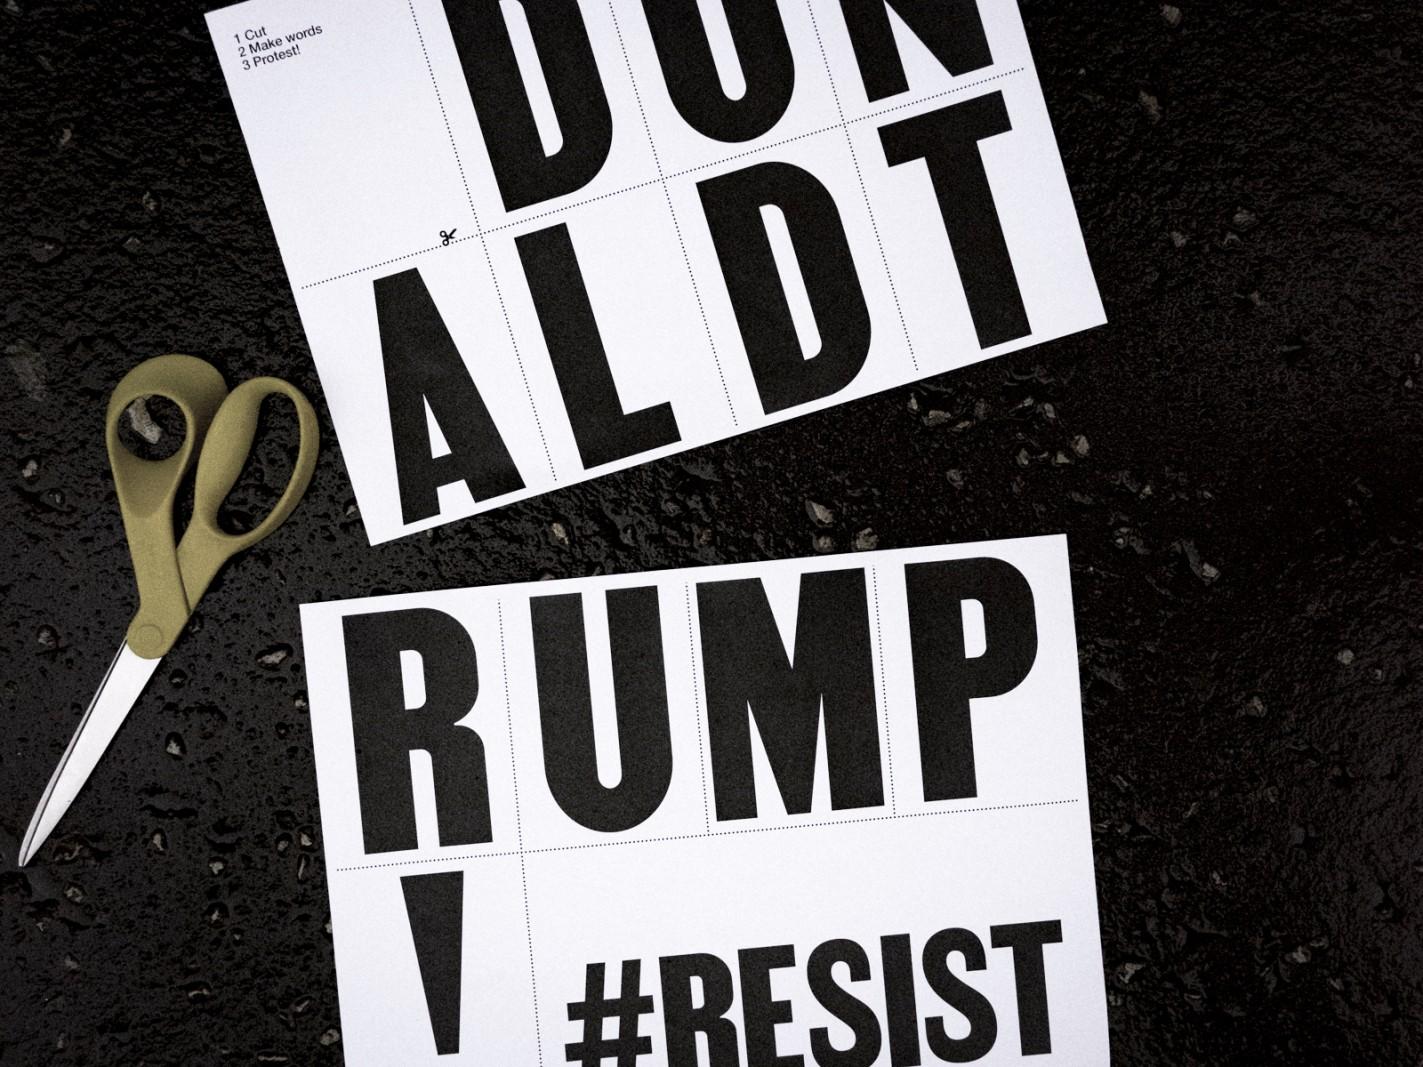 O Street against Trump